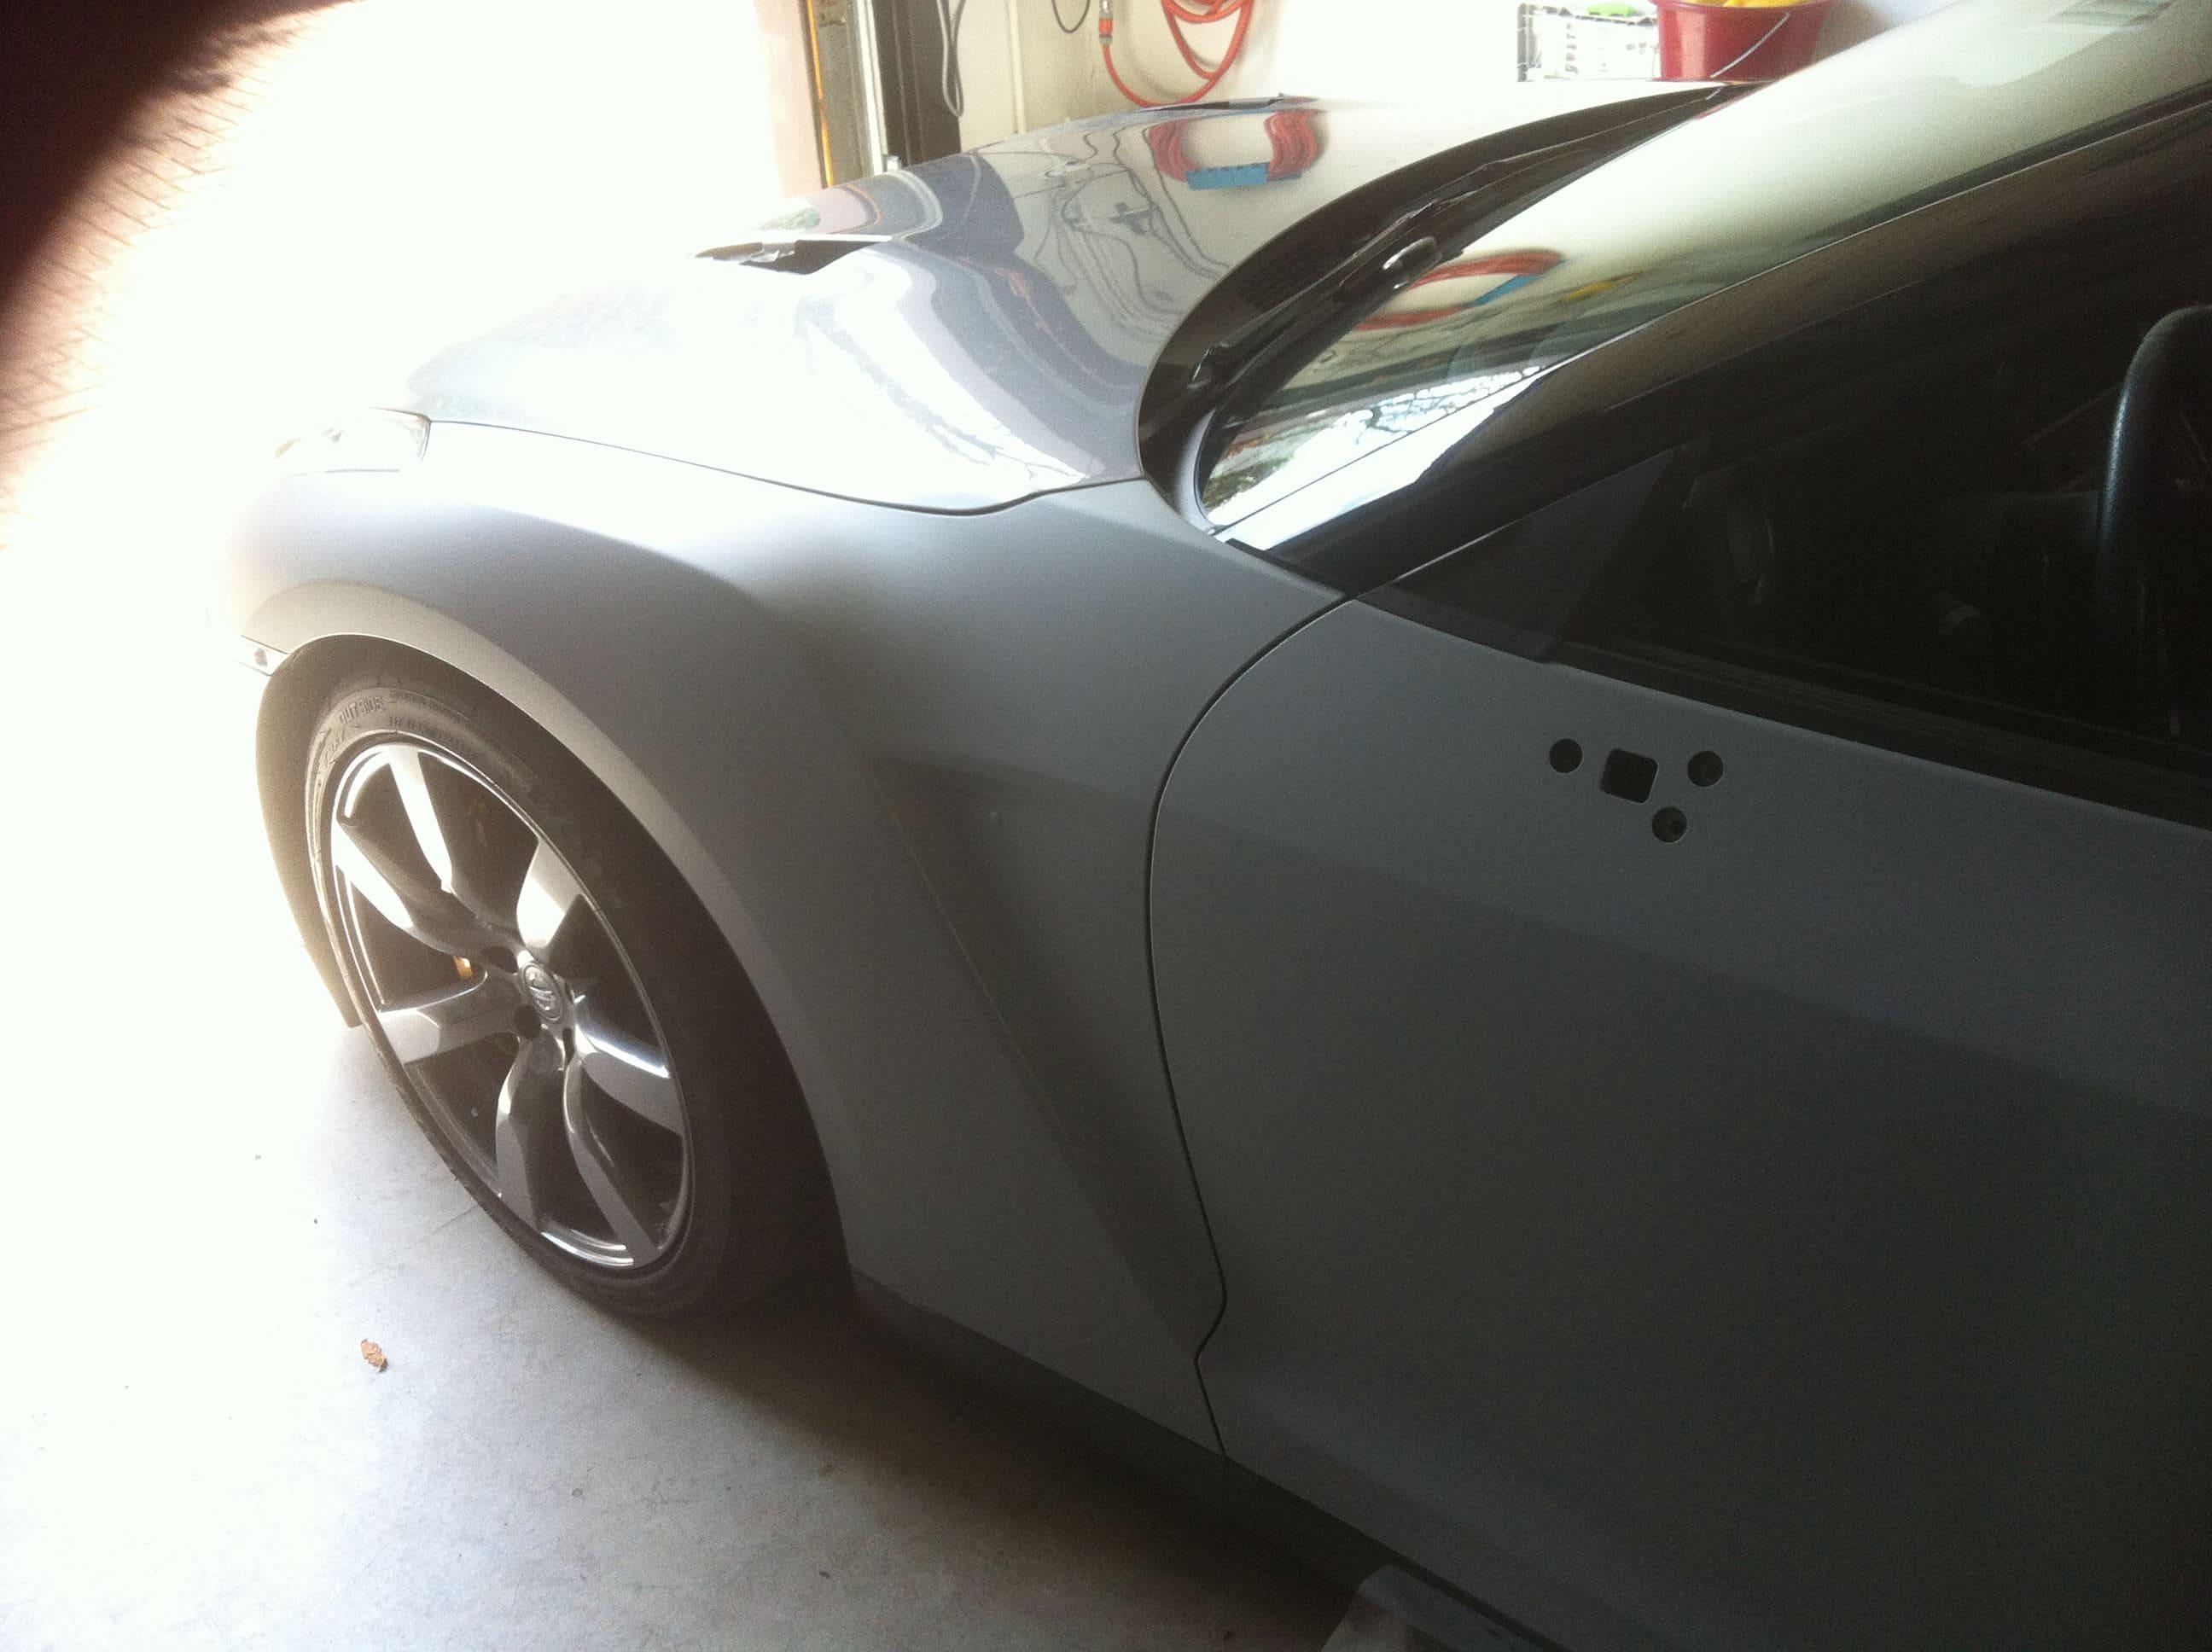 Nissan GT-R met Mat Grijze Wrap, Carwrapping door Wrapmyride.nu Foto-nr:6546, ©2021